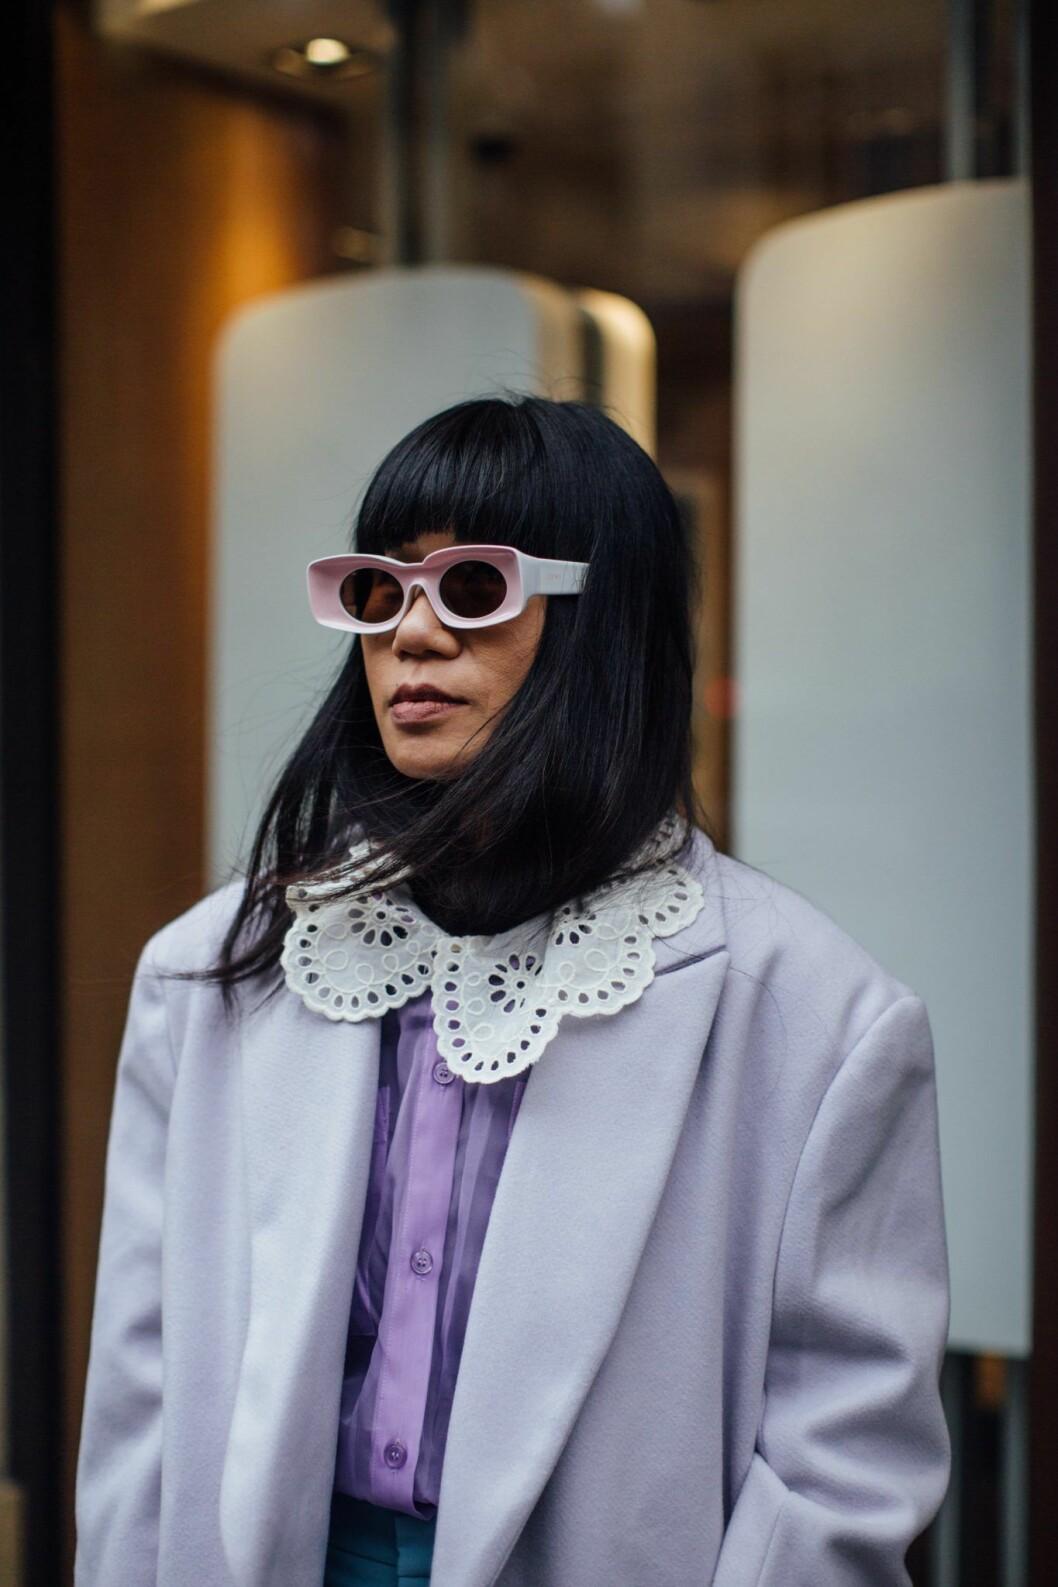 blus med krage i lila Streetstyle Paris Fashion Week AW20.